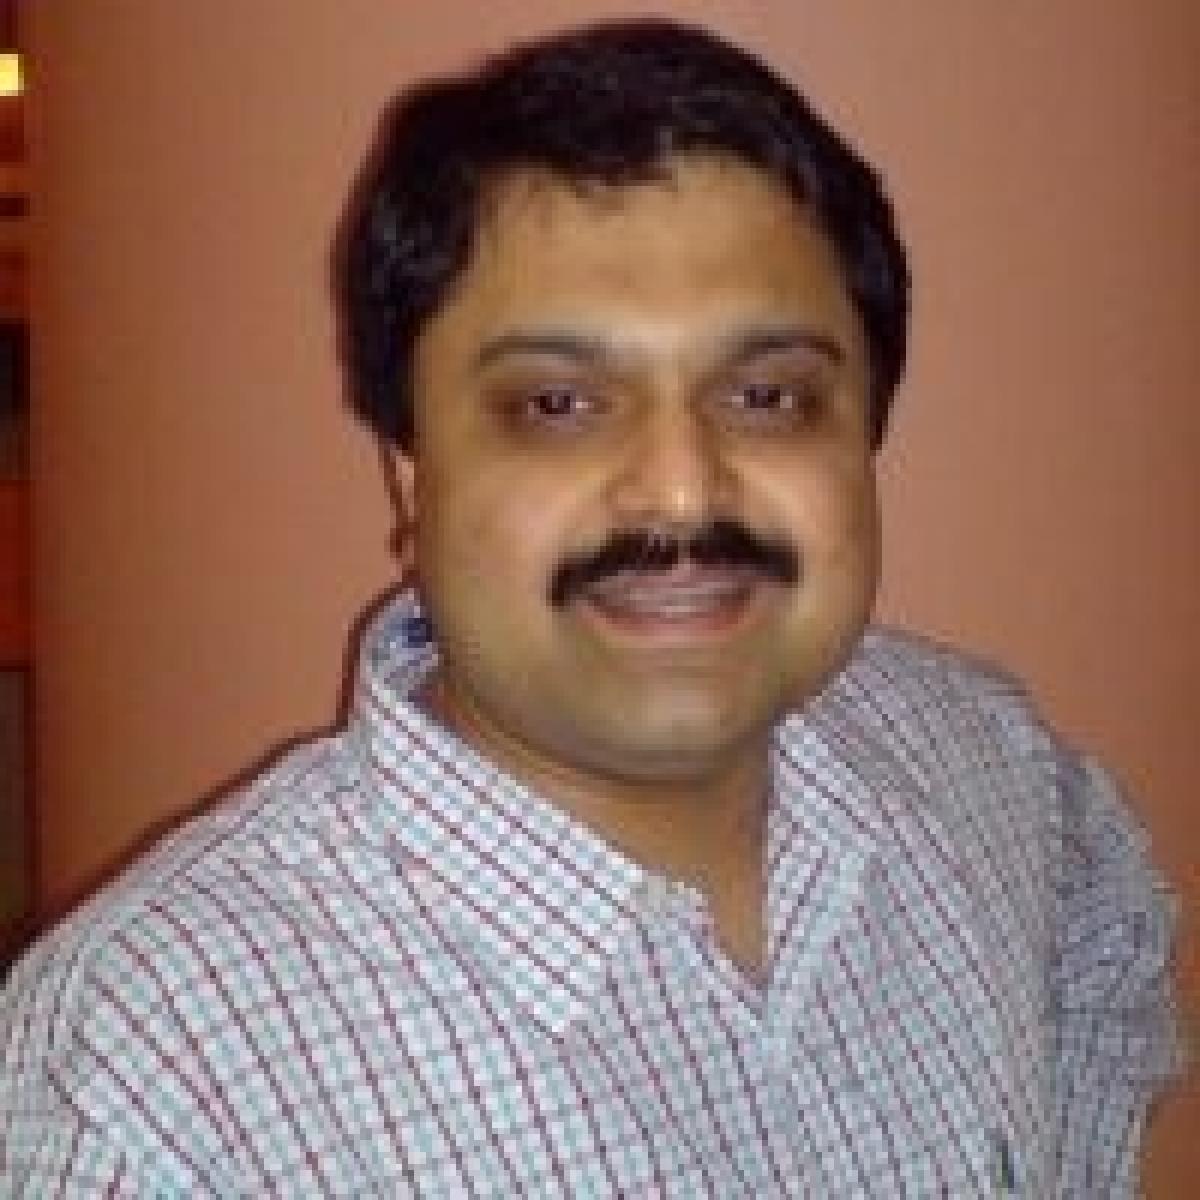 Karthik Lakshminarayan